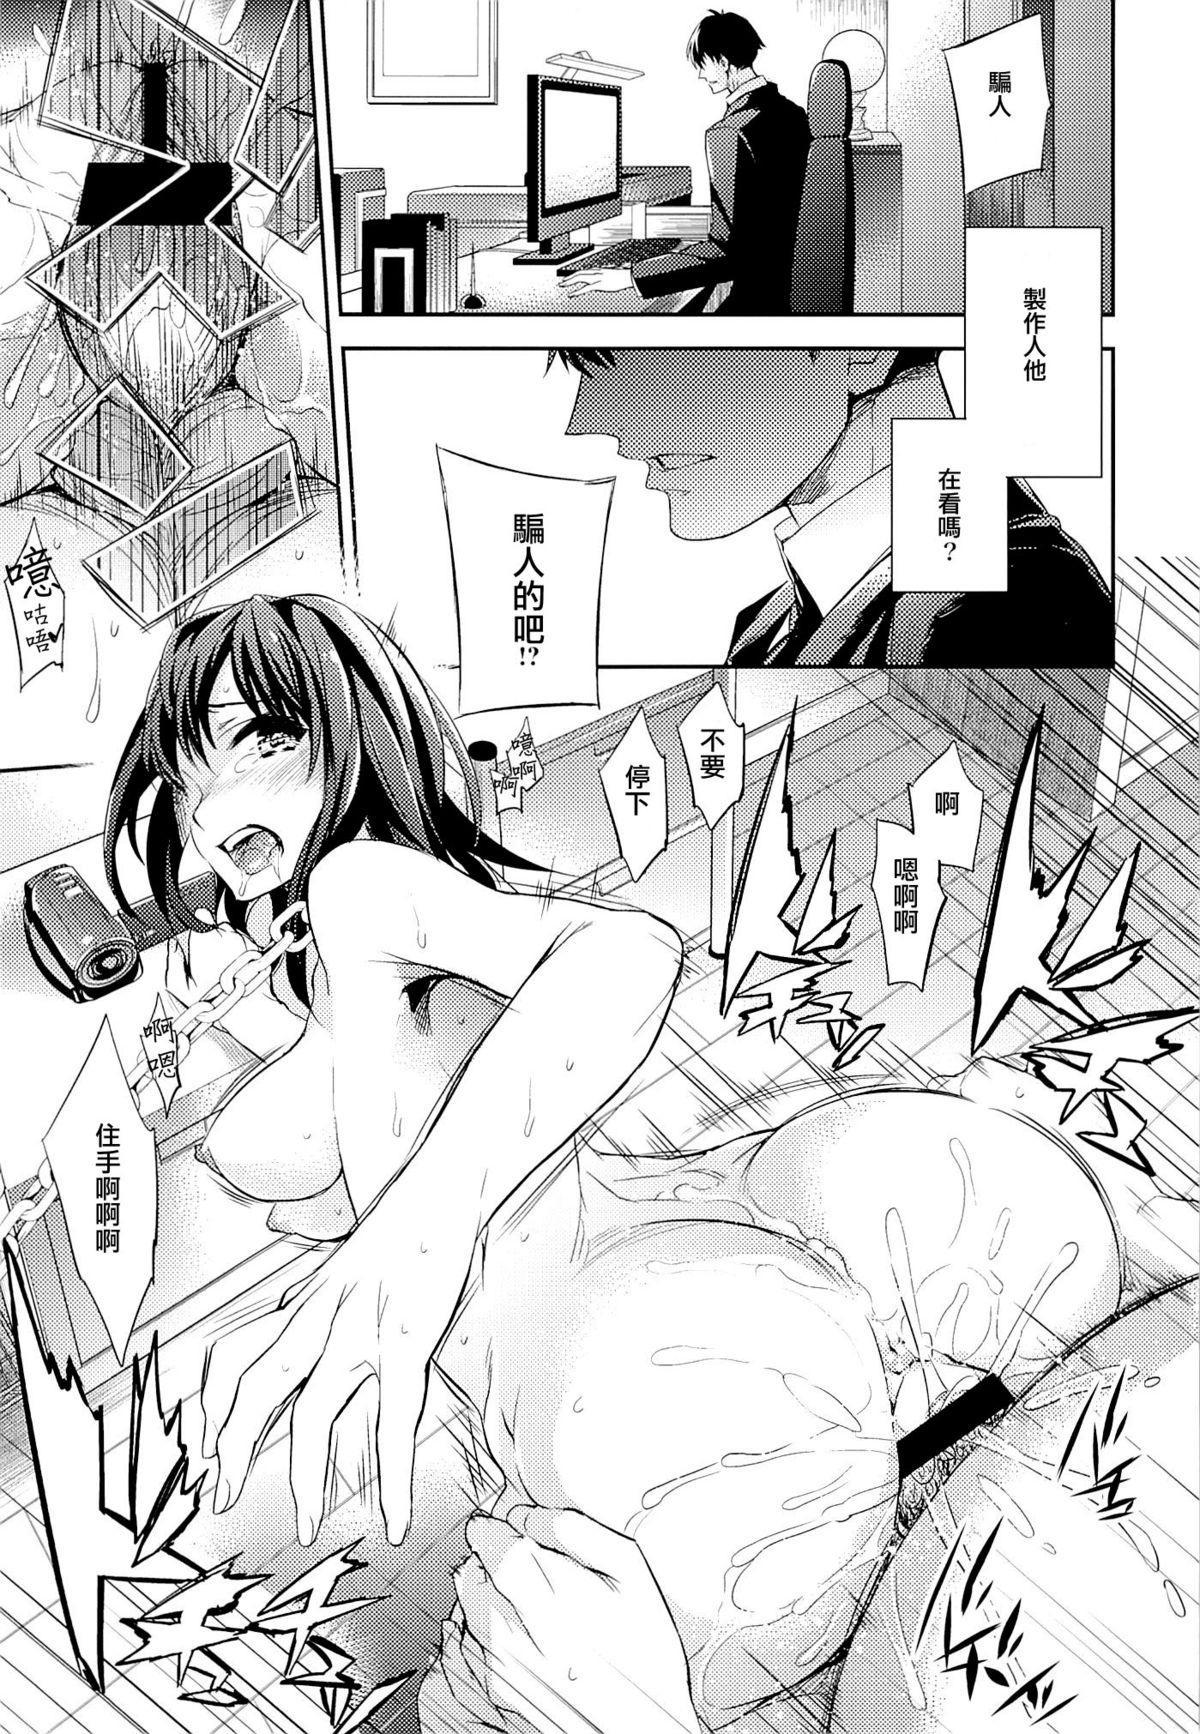 (COMIC1☆9) [Crazy9 (Ichitaka)] C9-18 Shiburin Kankin 30-nichi (THE IDOLM@STER CINDERELLA GIRLS) [Chinese] [CE家族社] 22